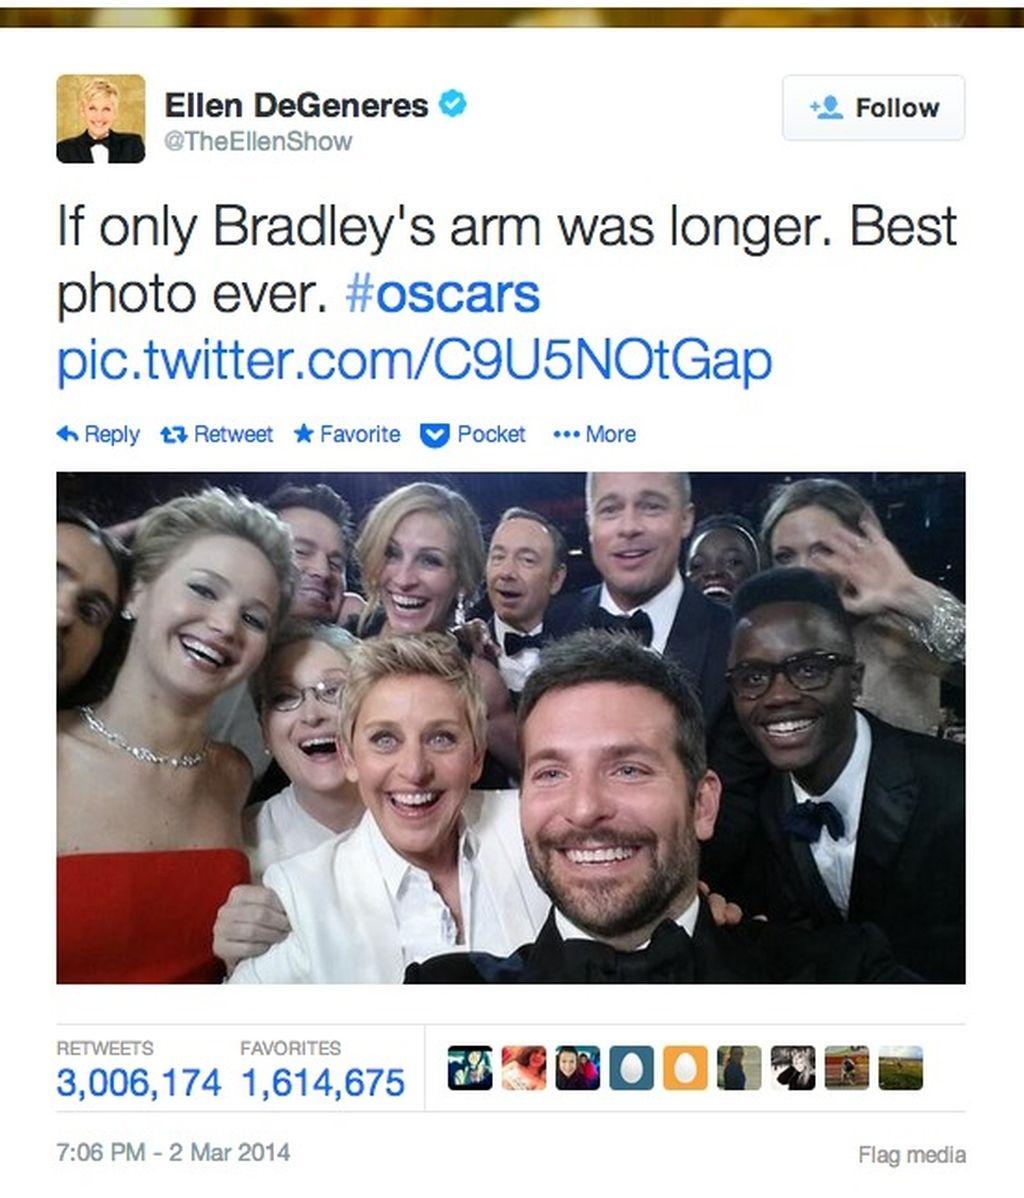 El selfie de los tres millones de retuits